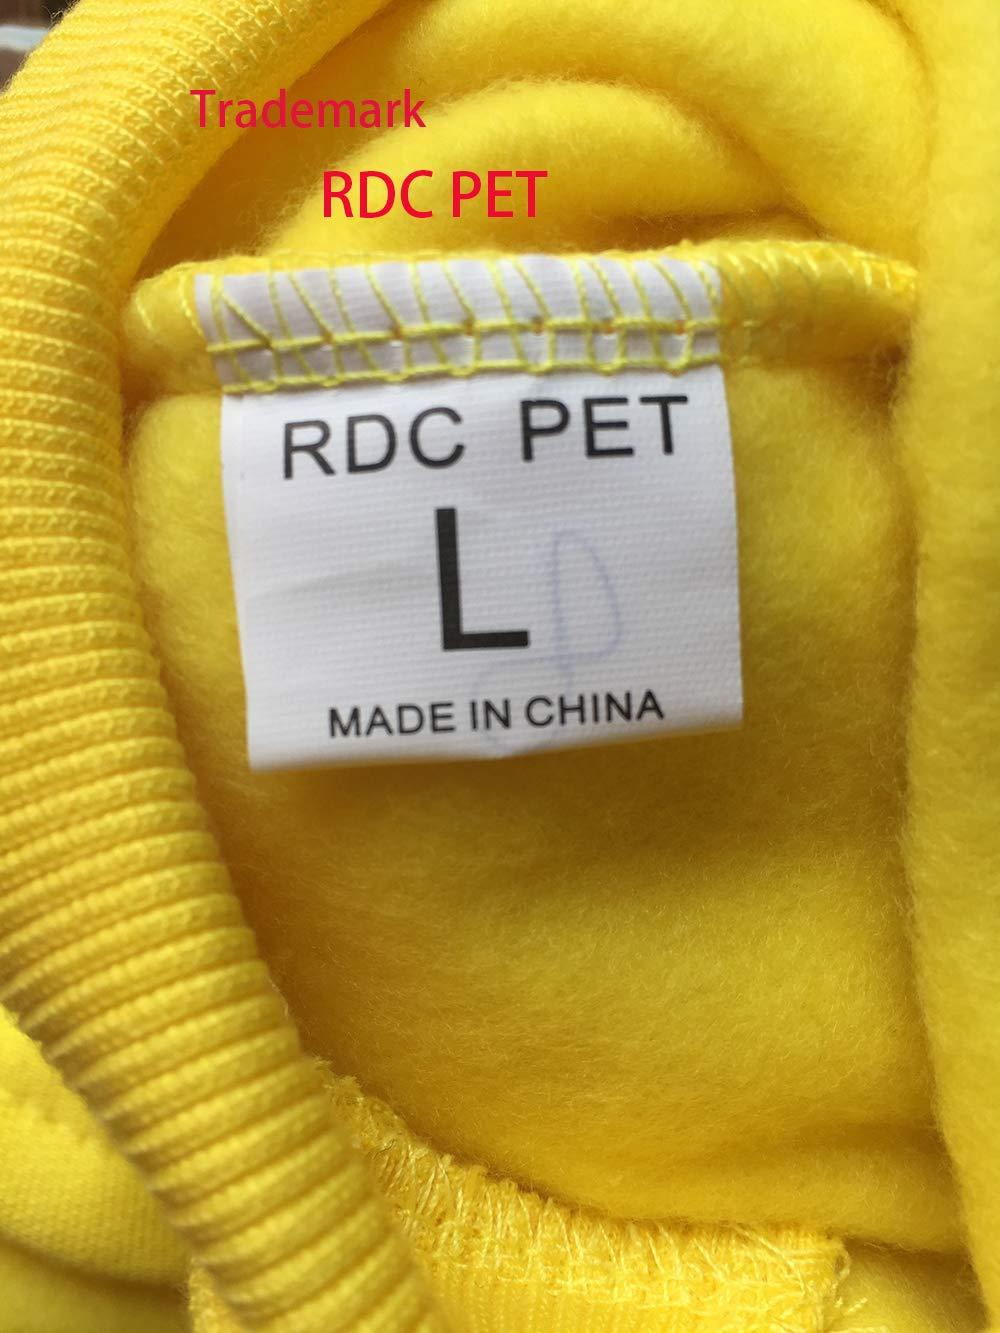 4XL, Green Adidog Dog Hoodies,Rdc Pet Clothes,Fleece Basic Hoodie Warm Sweater,4 Legs Cotton Jacket Sweat Shirt Coat for Small Dog Medium Dog Cat